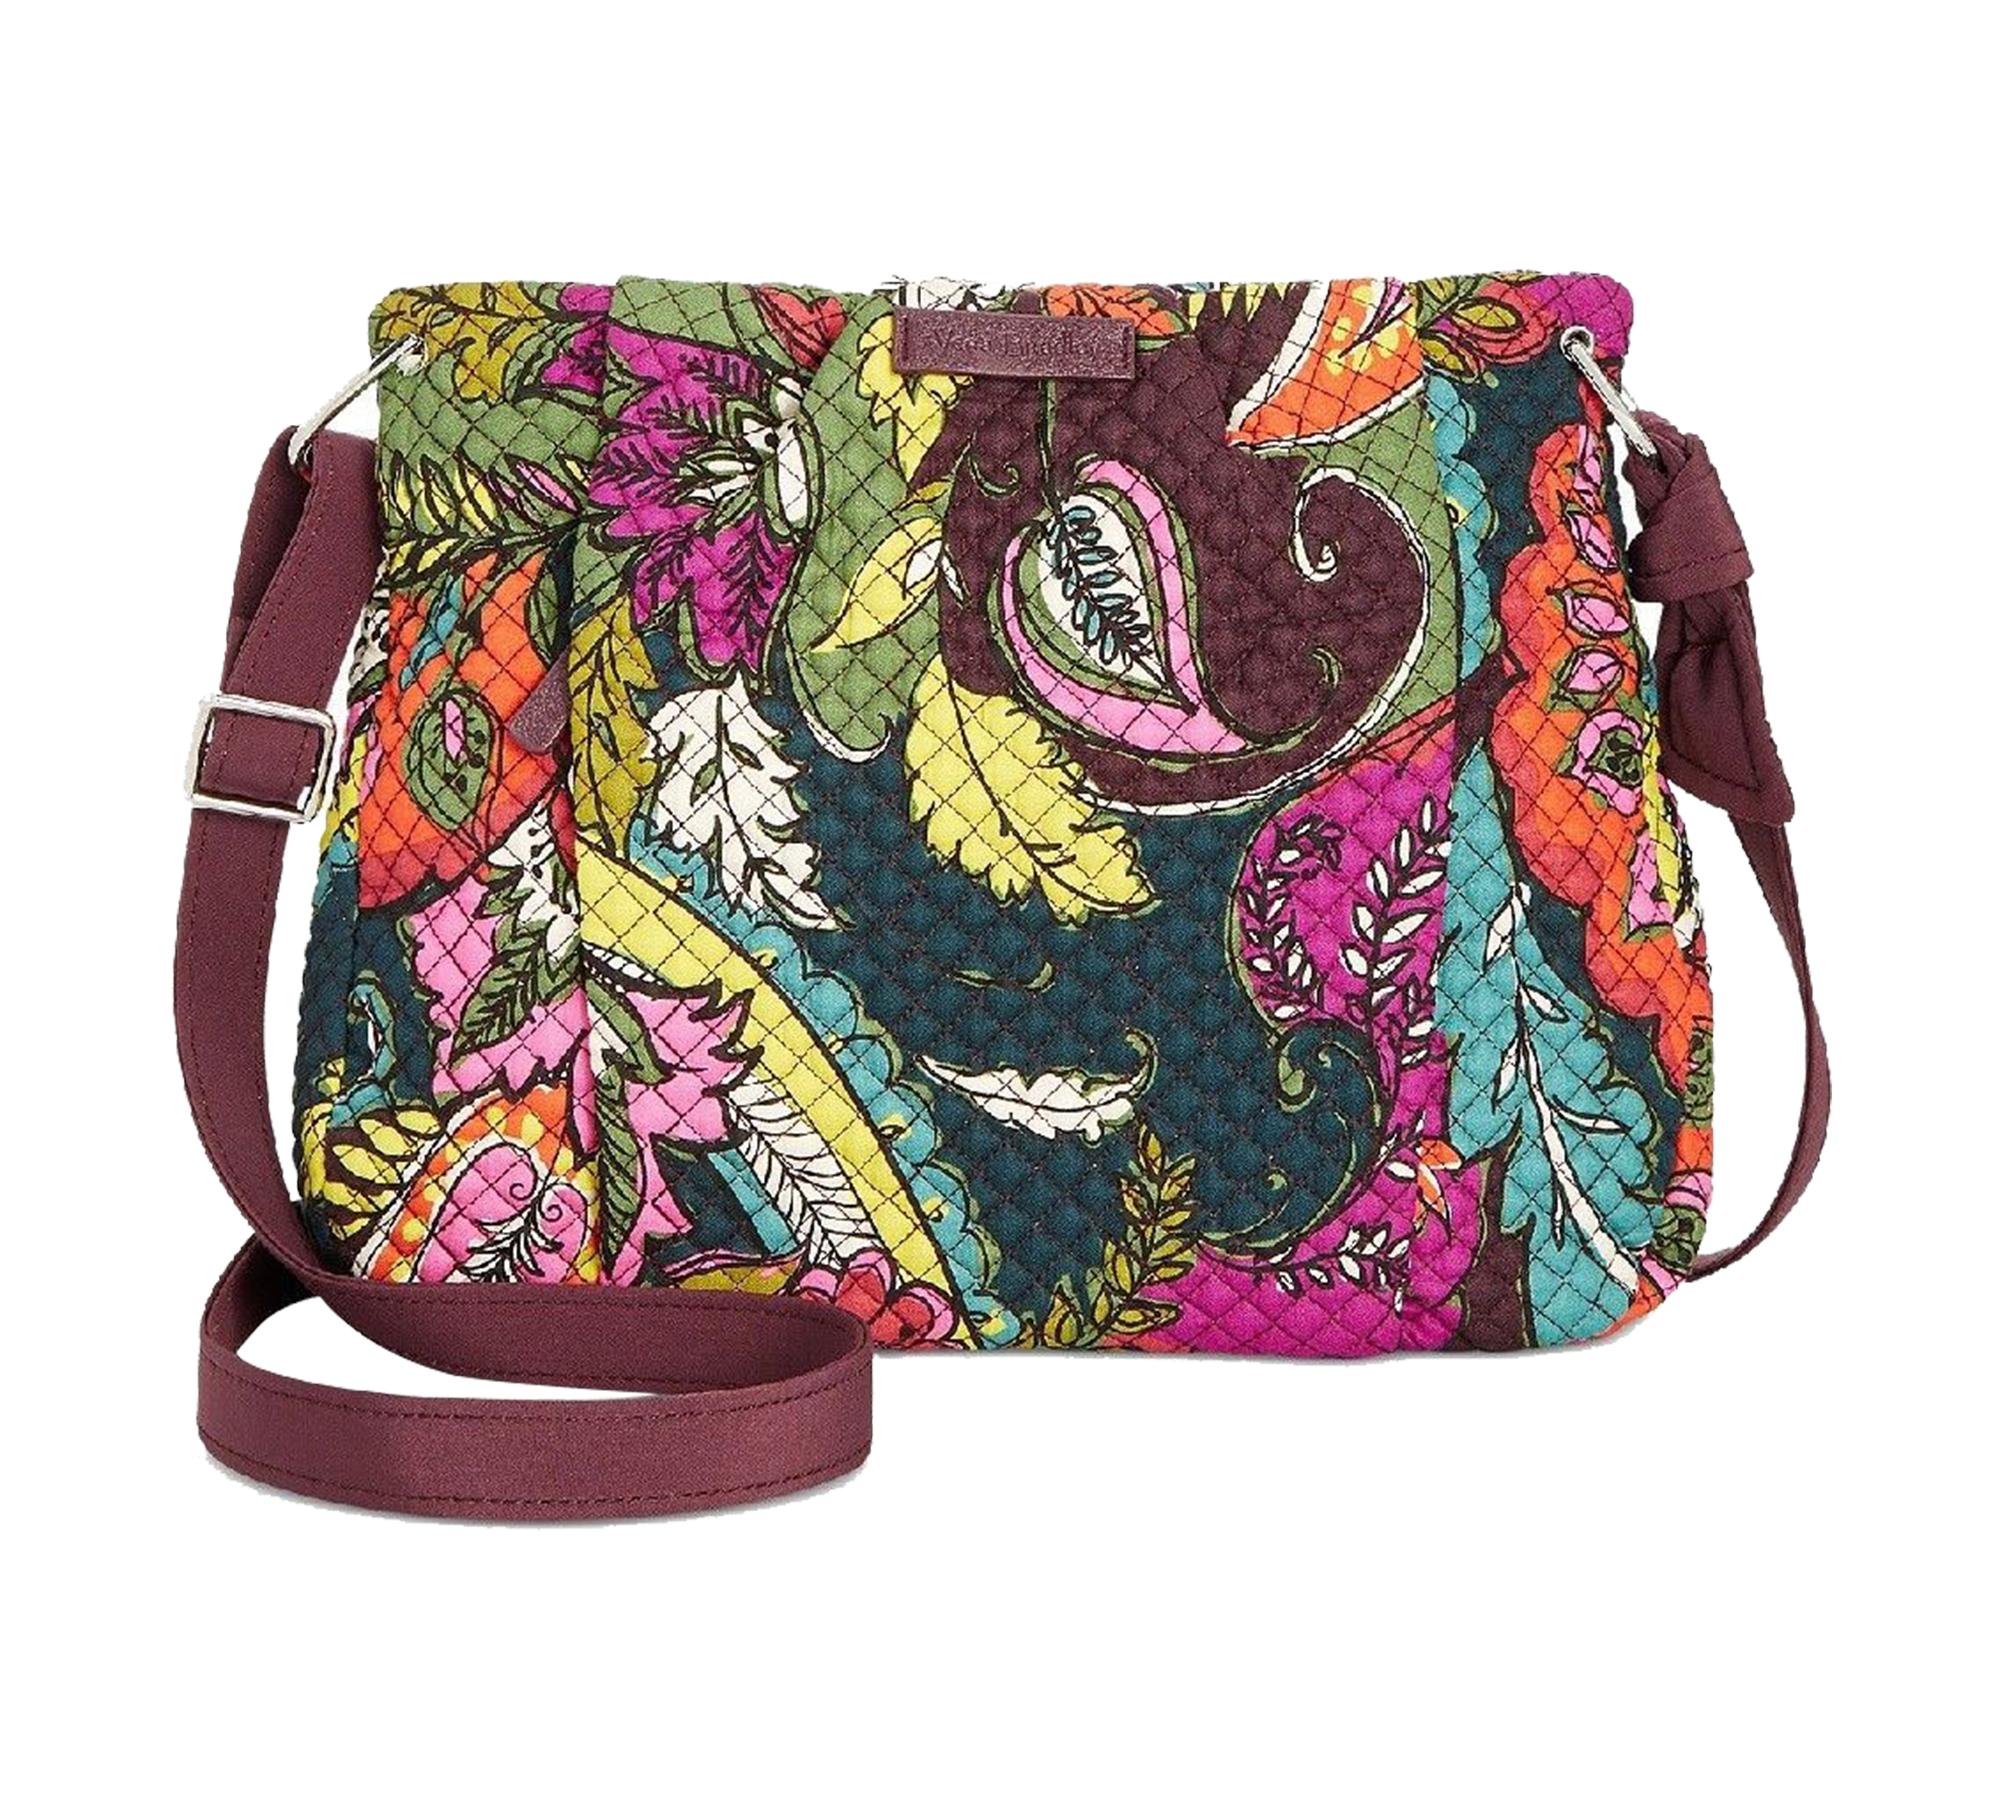 Shop for Vera Bradley Hadley Crossbody Signature Cotton Autumn ... ab386b87ae752